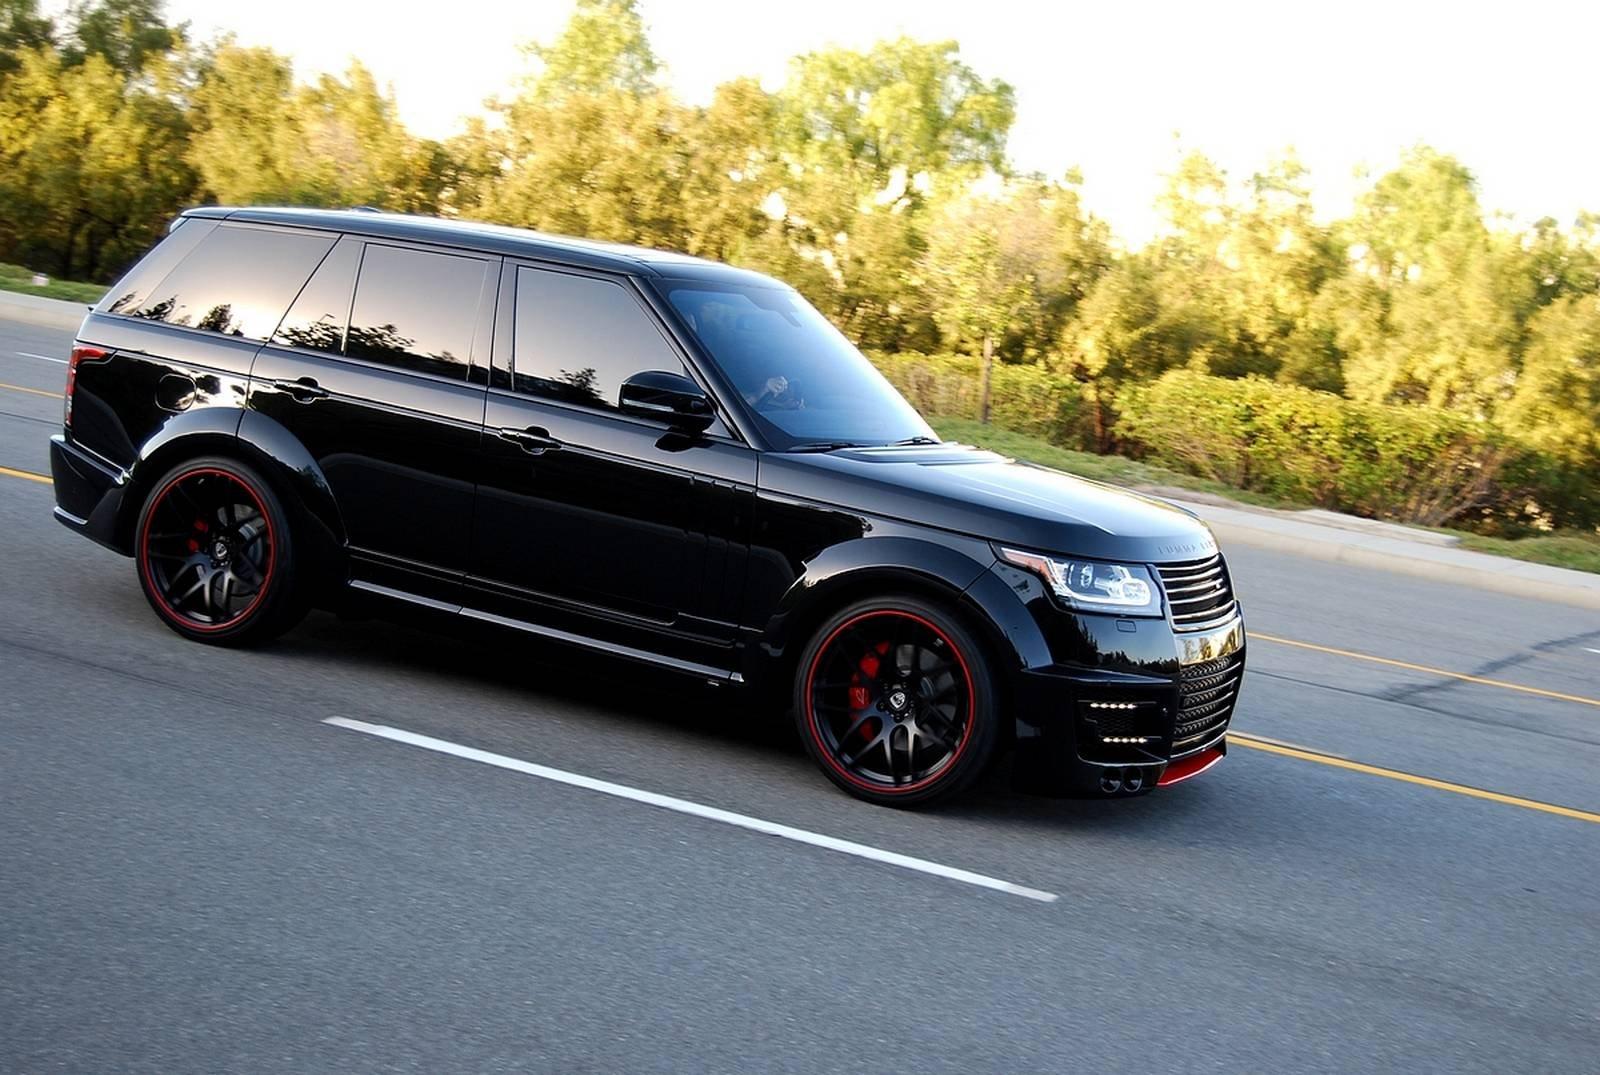 Lumma Design CLR-R Range Rover black cars suv all road ...